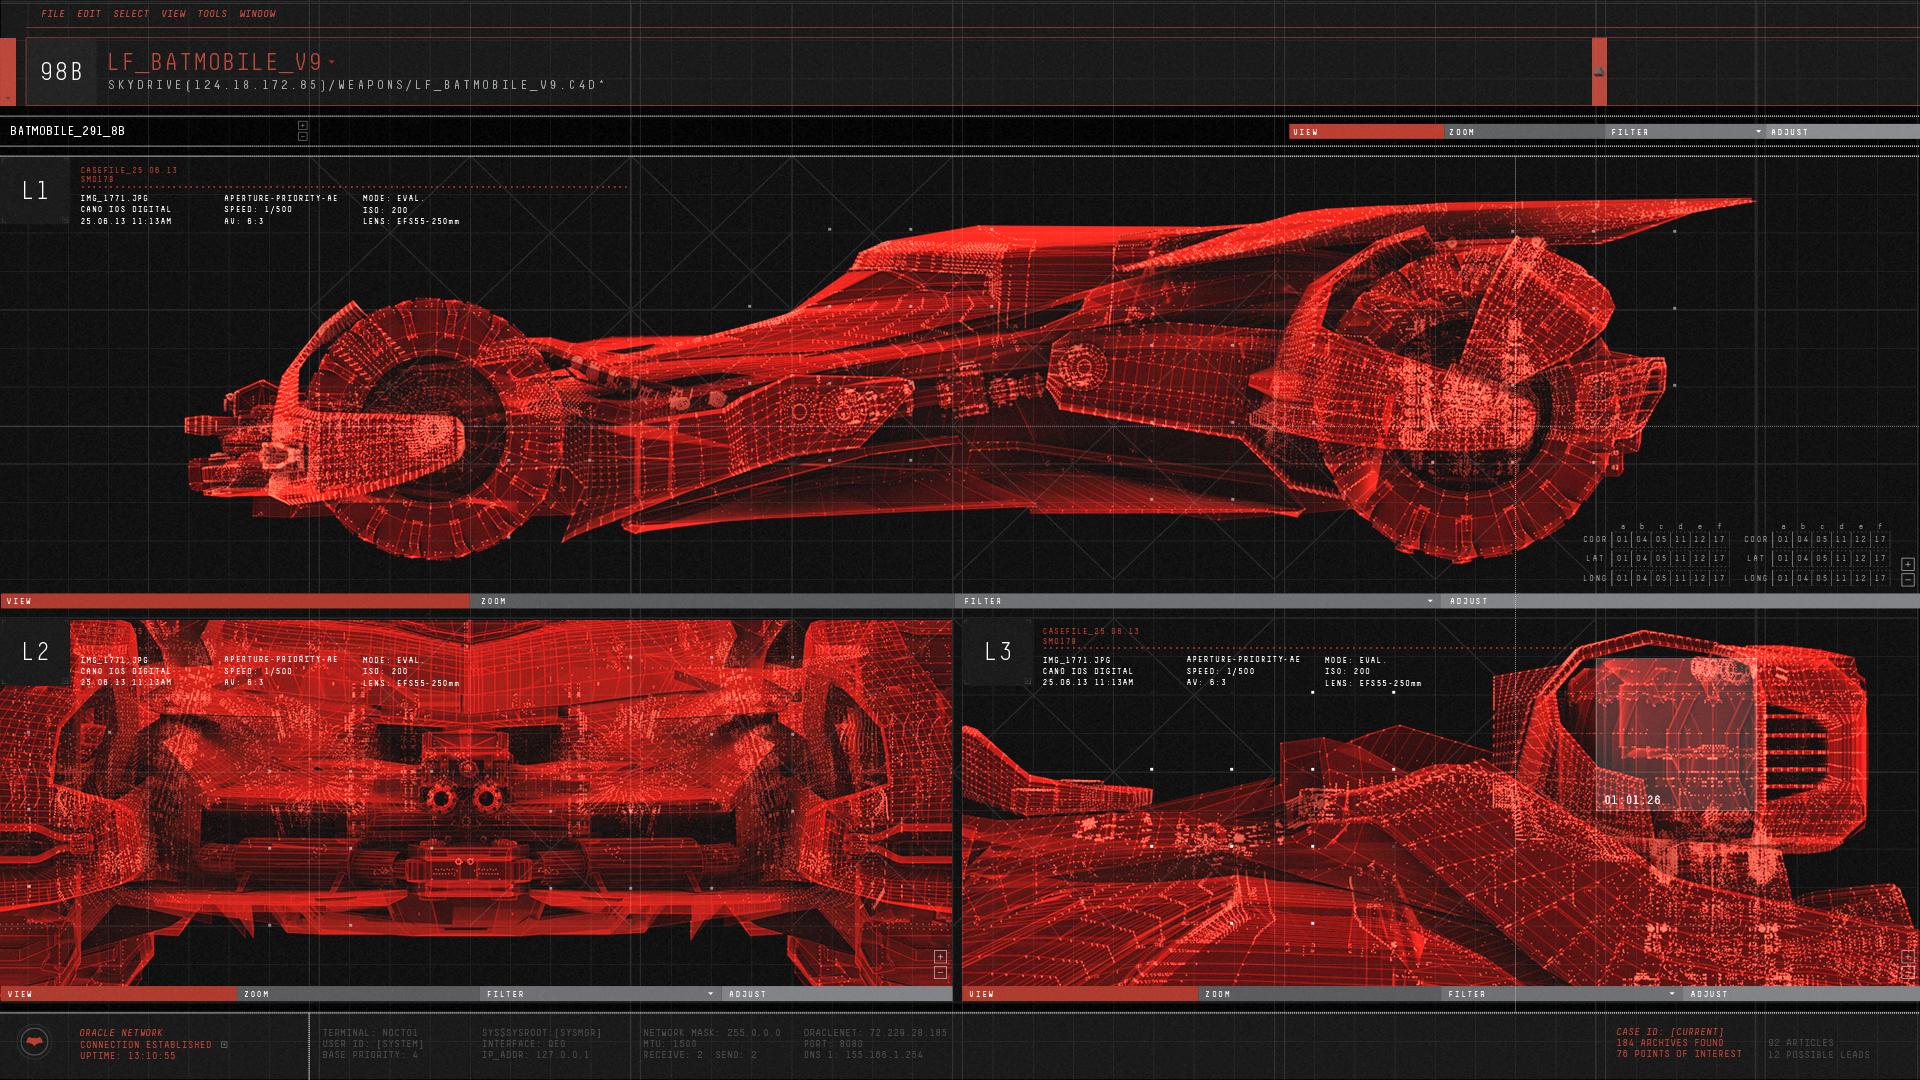 BatcaveOS_batmobile_2_001.jpg